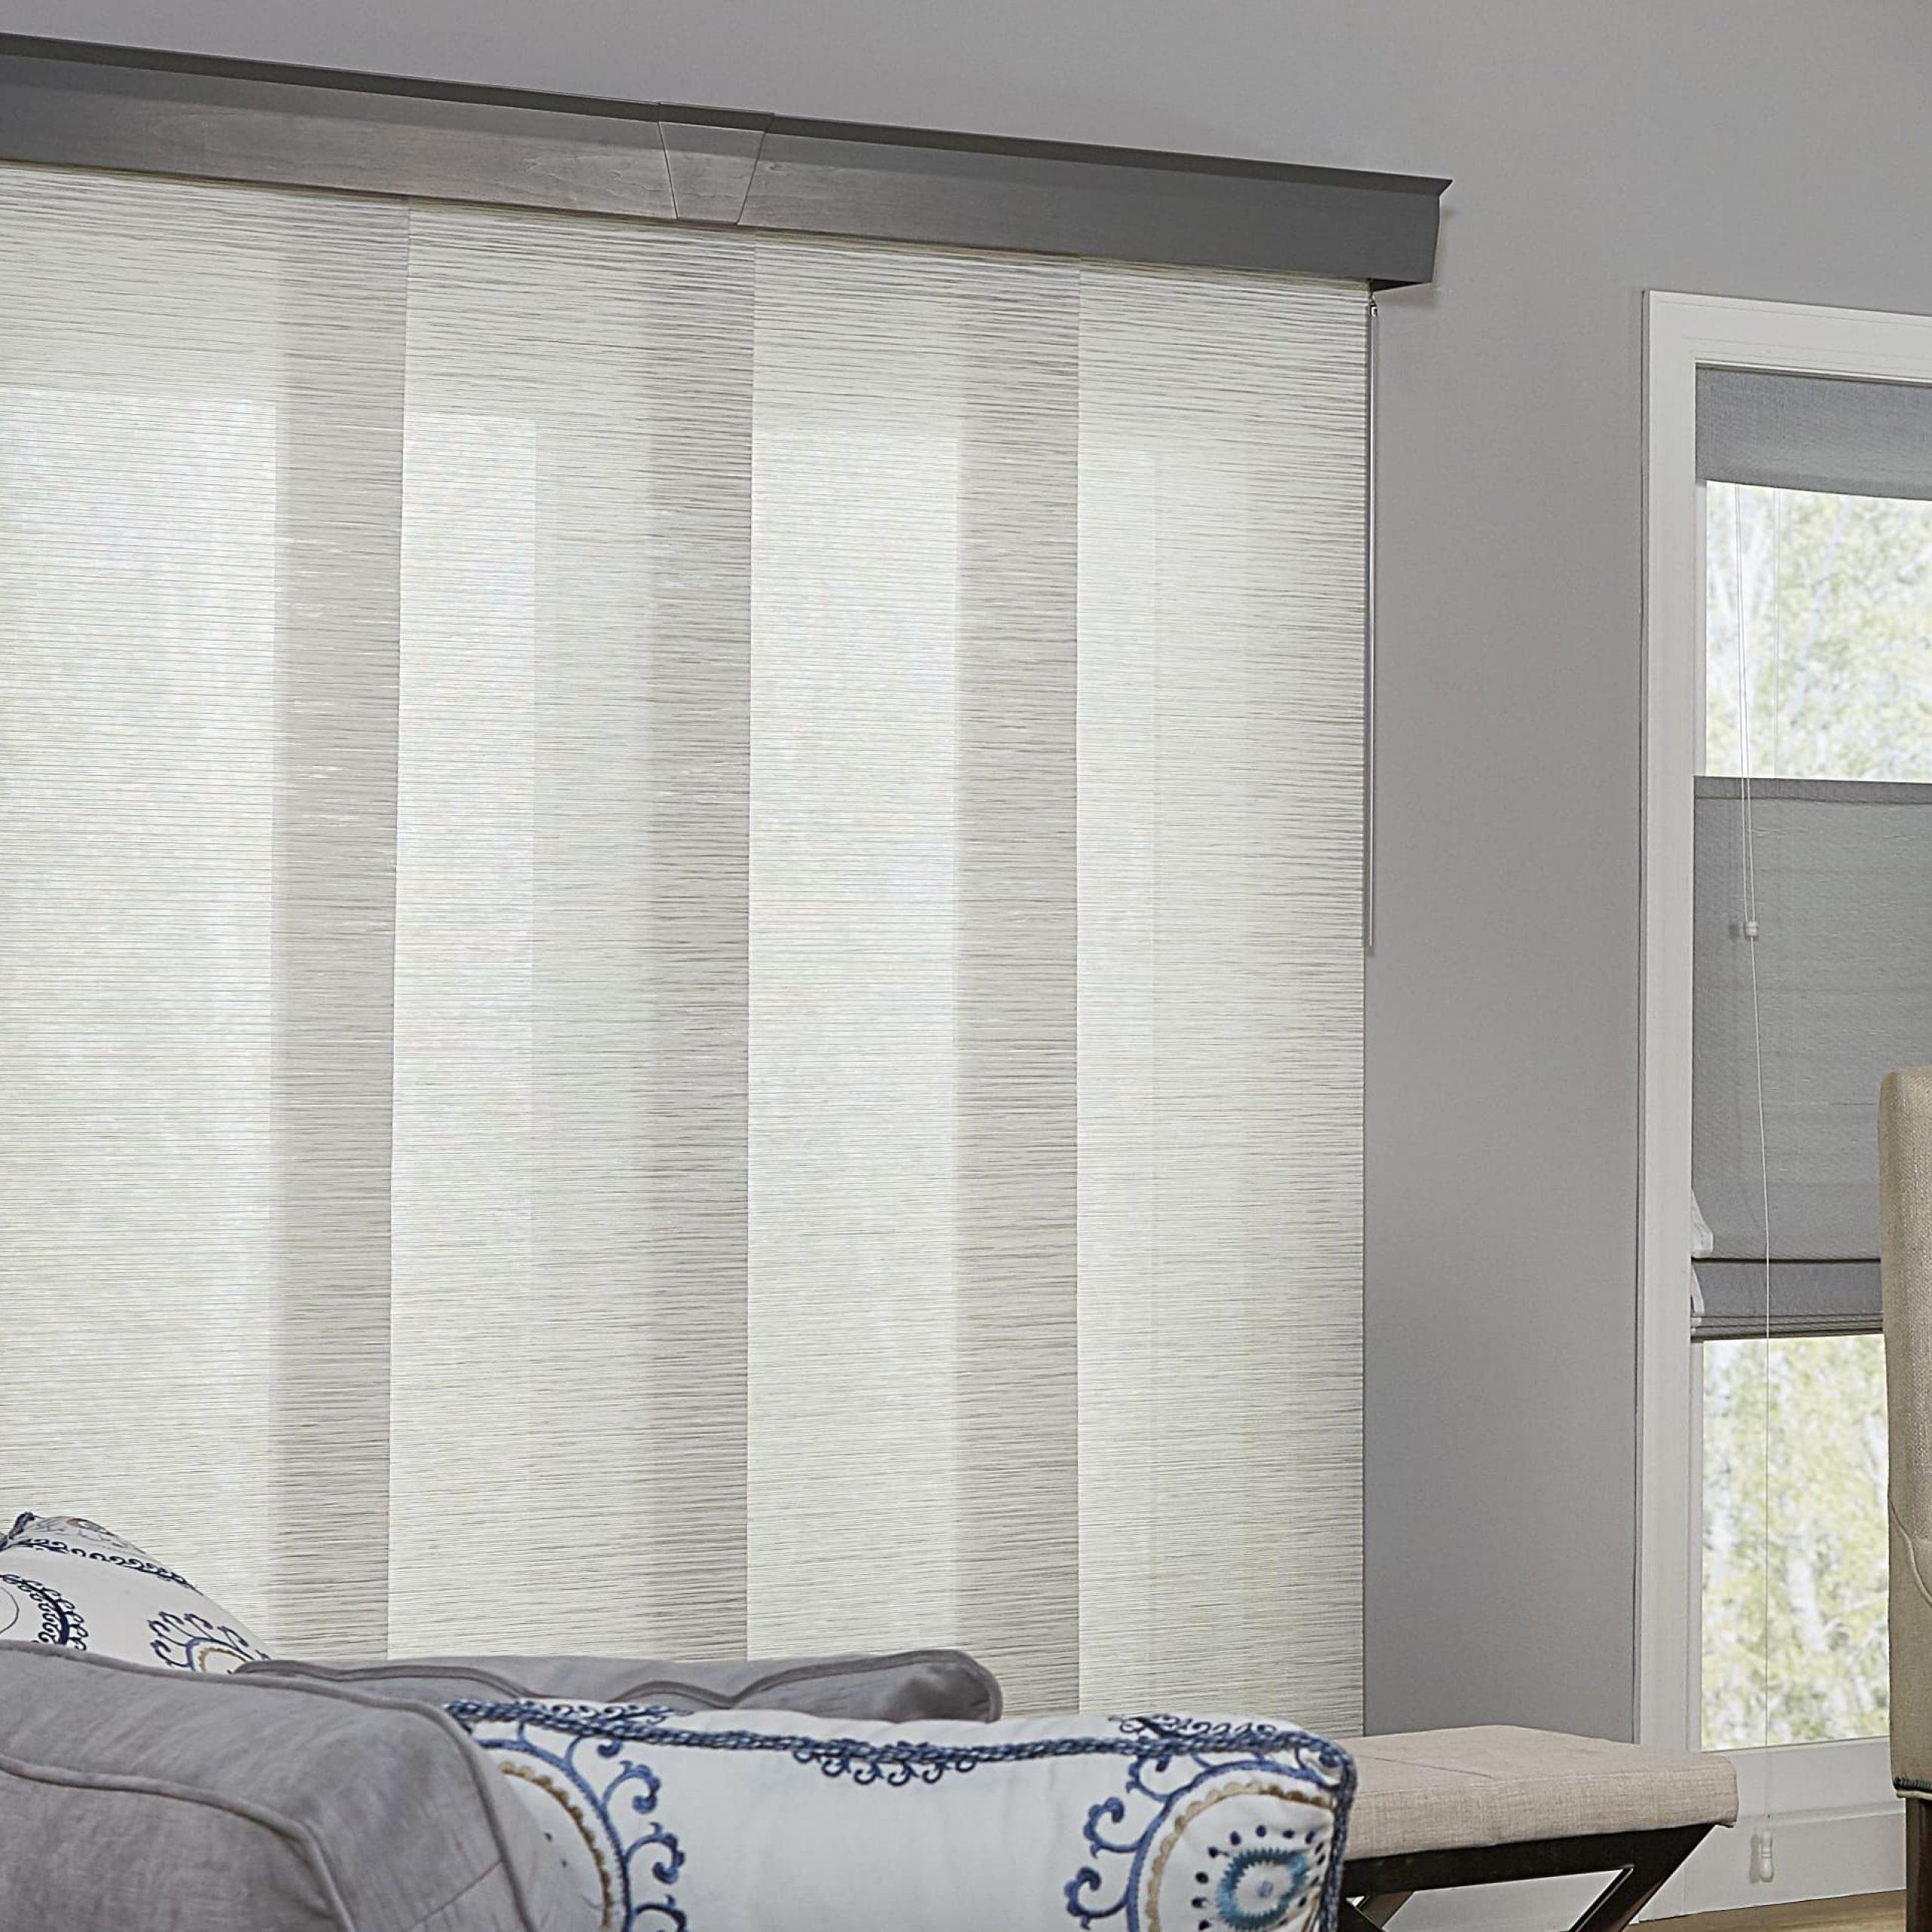 Pretty Popular Window Treatments For Sliding Glass Doors With Favorite Inez Patio Door Window Curtain Panels (View 18 of 20)